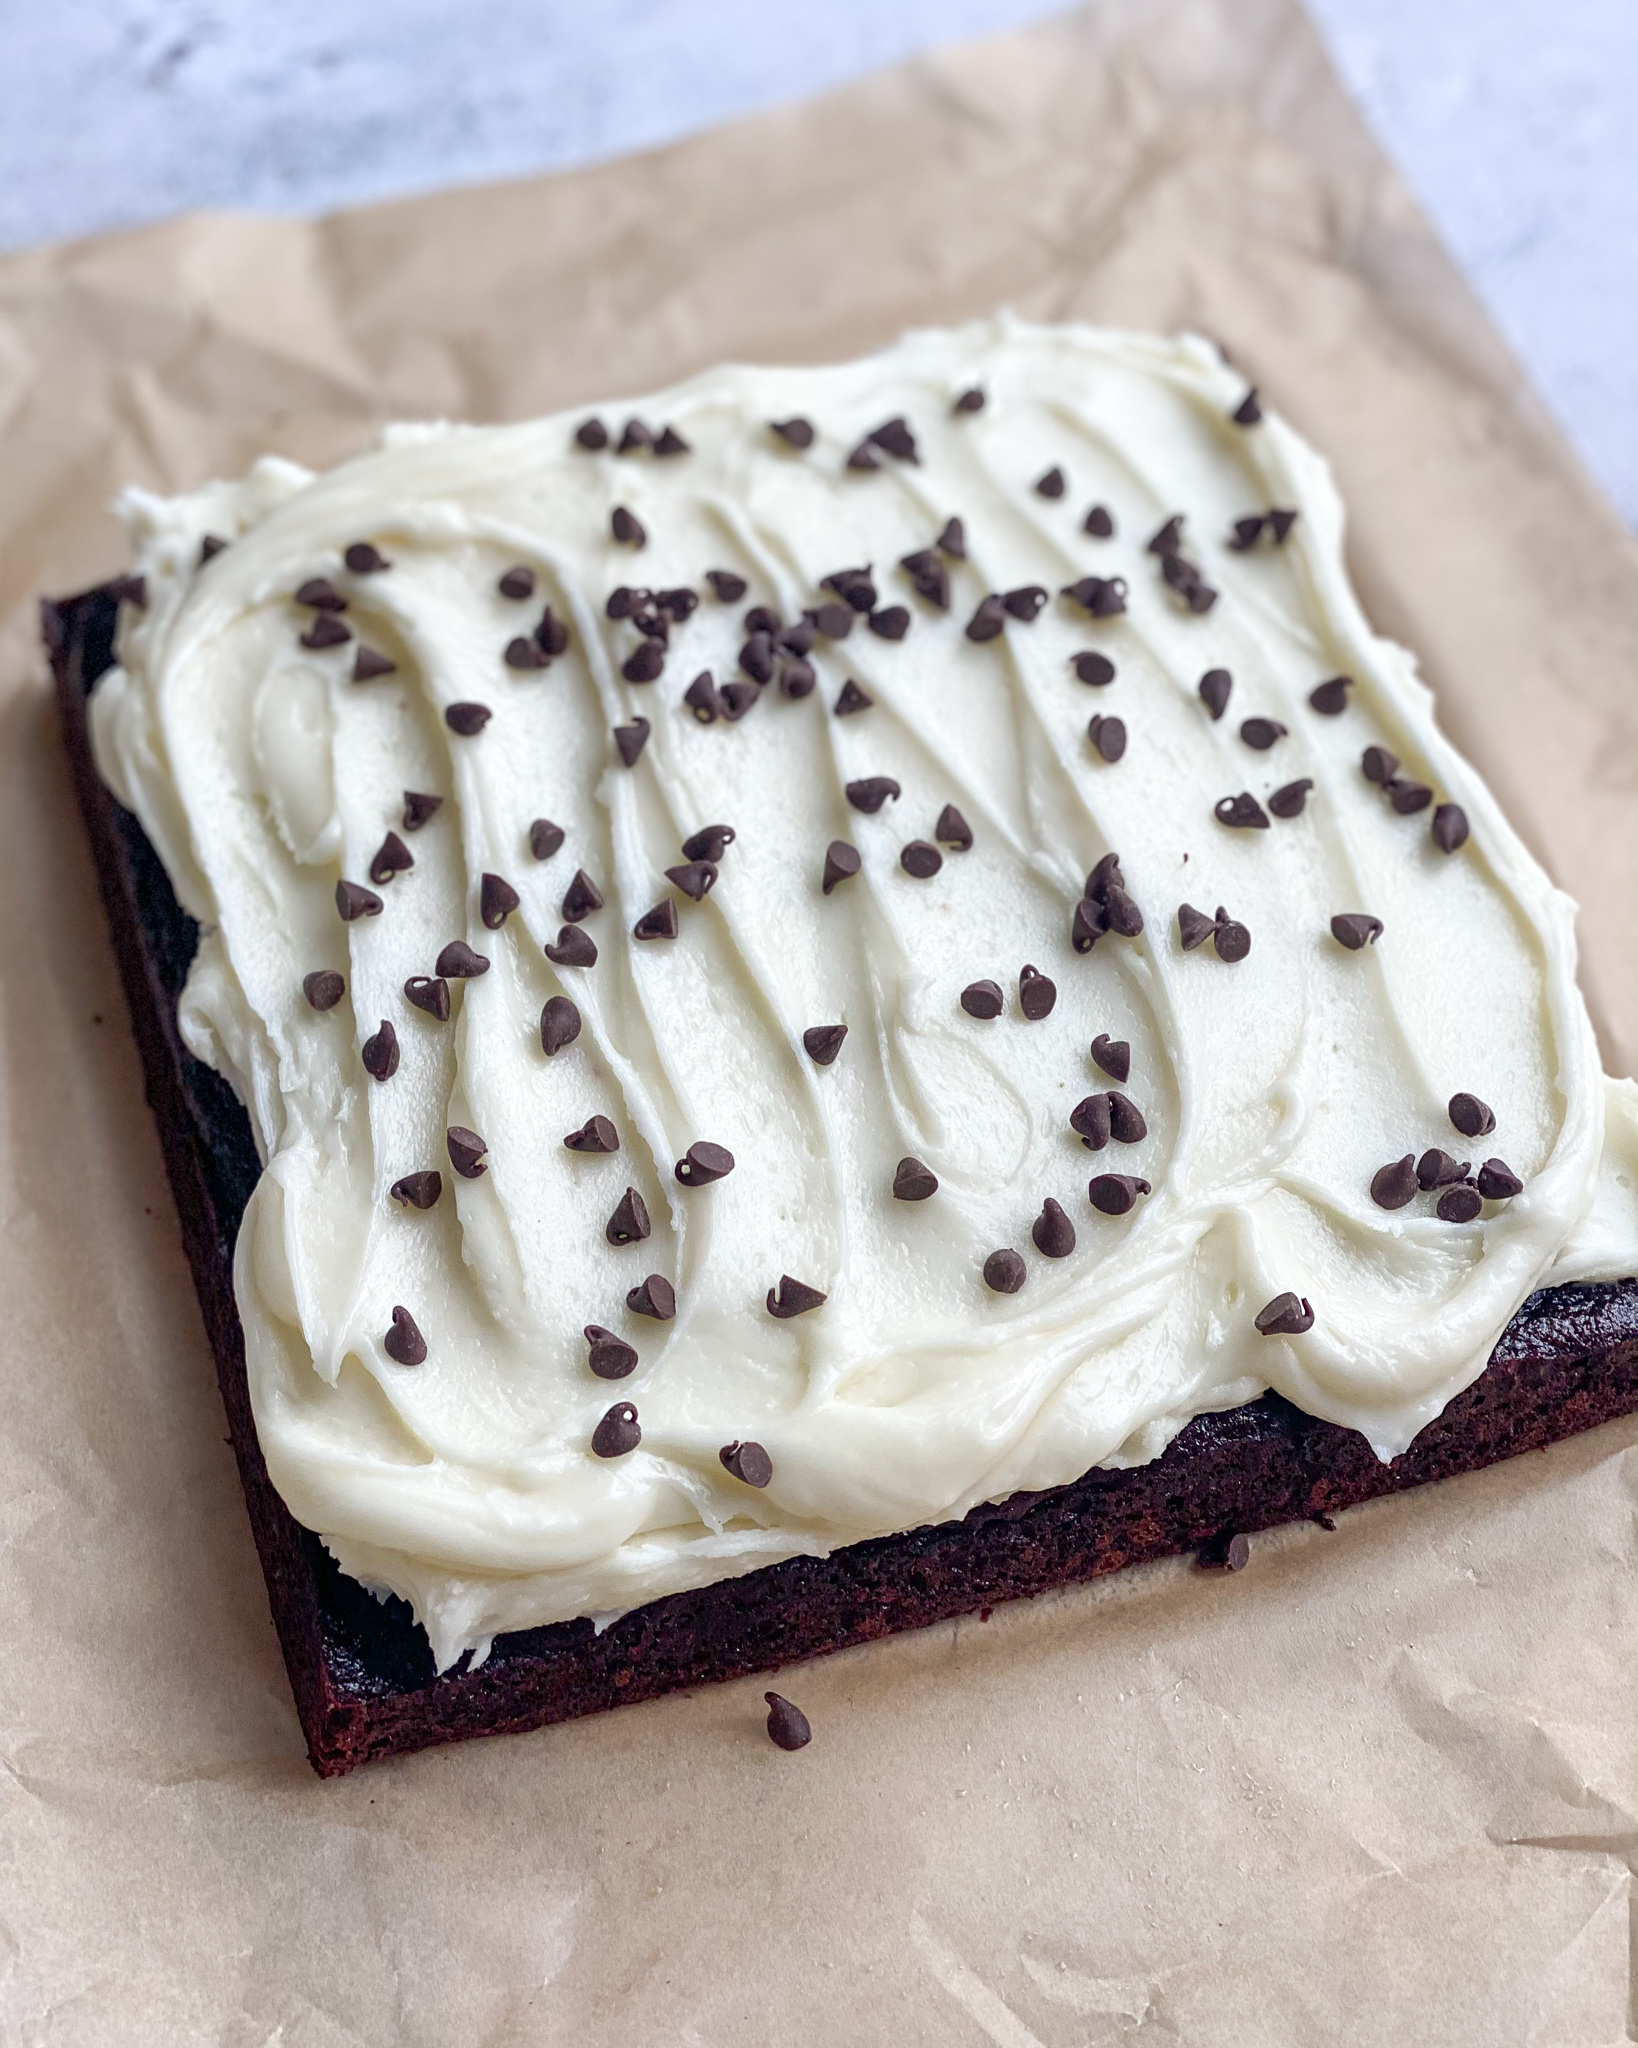 Gluten-Free Chocolate Chip Snack Cake